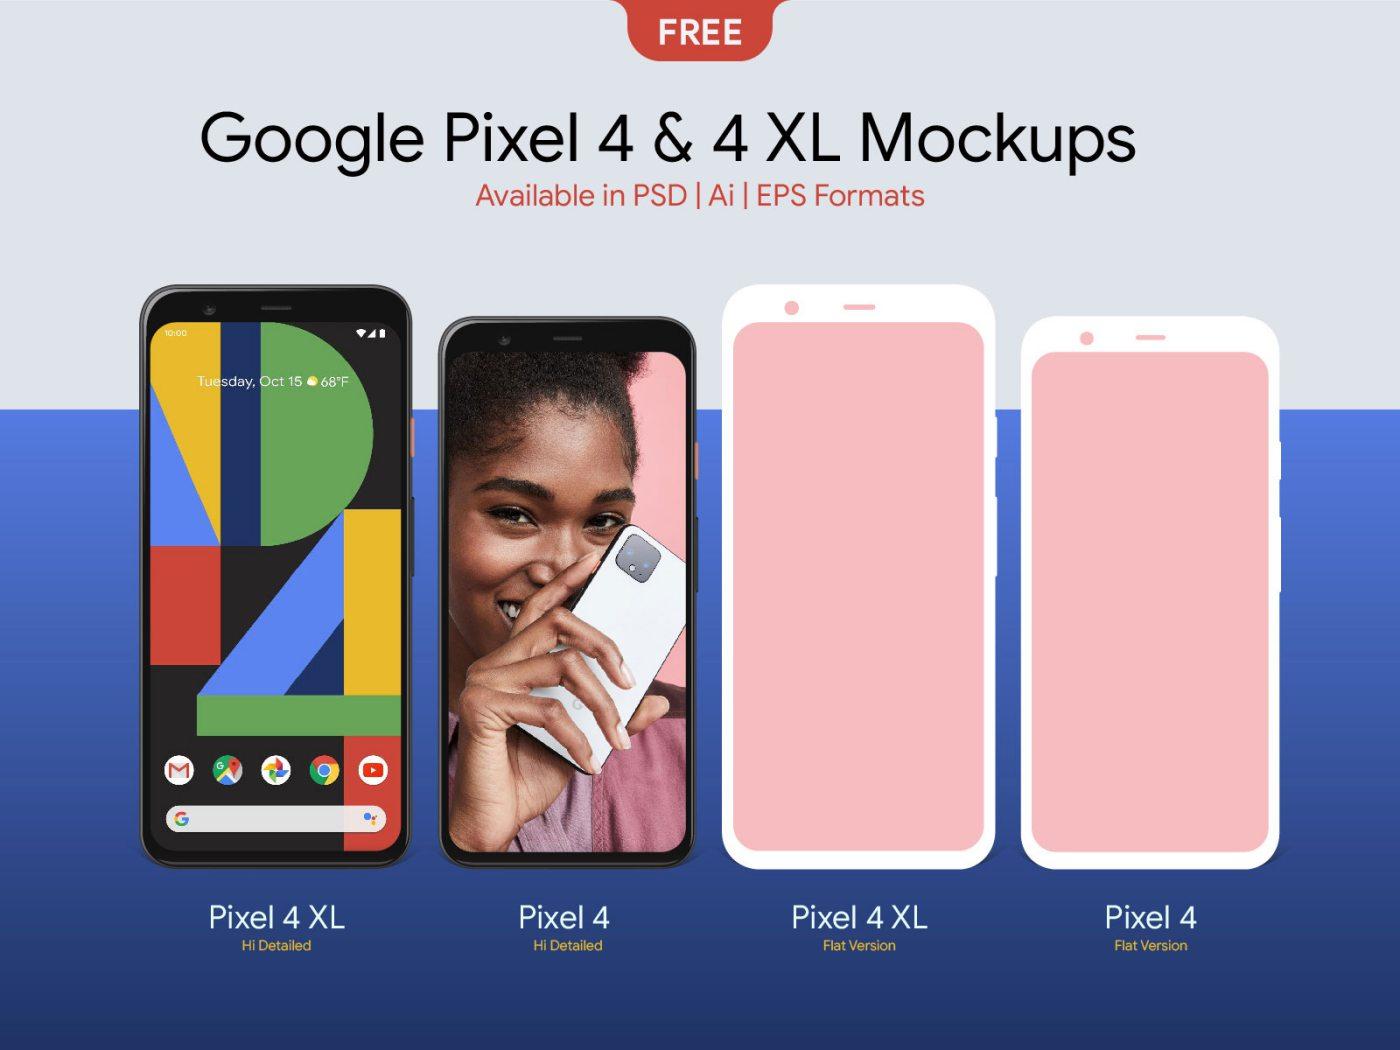 Free Google Pixel 4 & 4 XL Mockup PSD, Ai & EPS